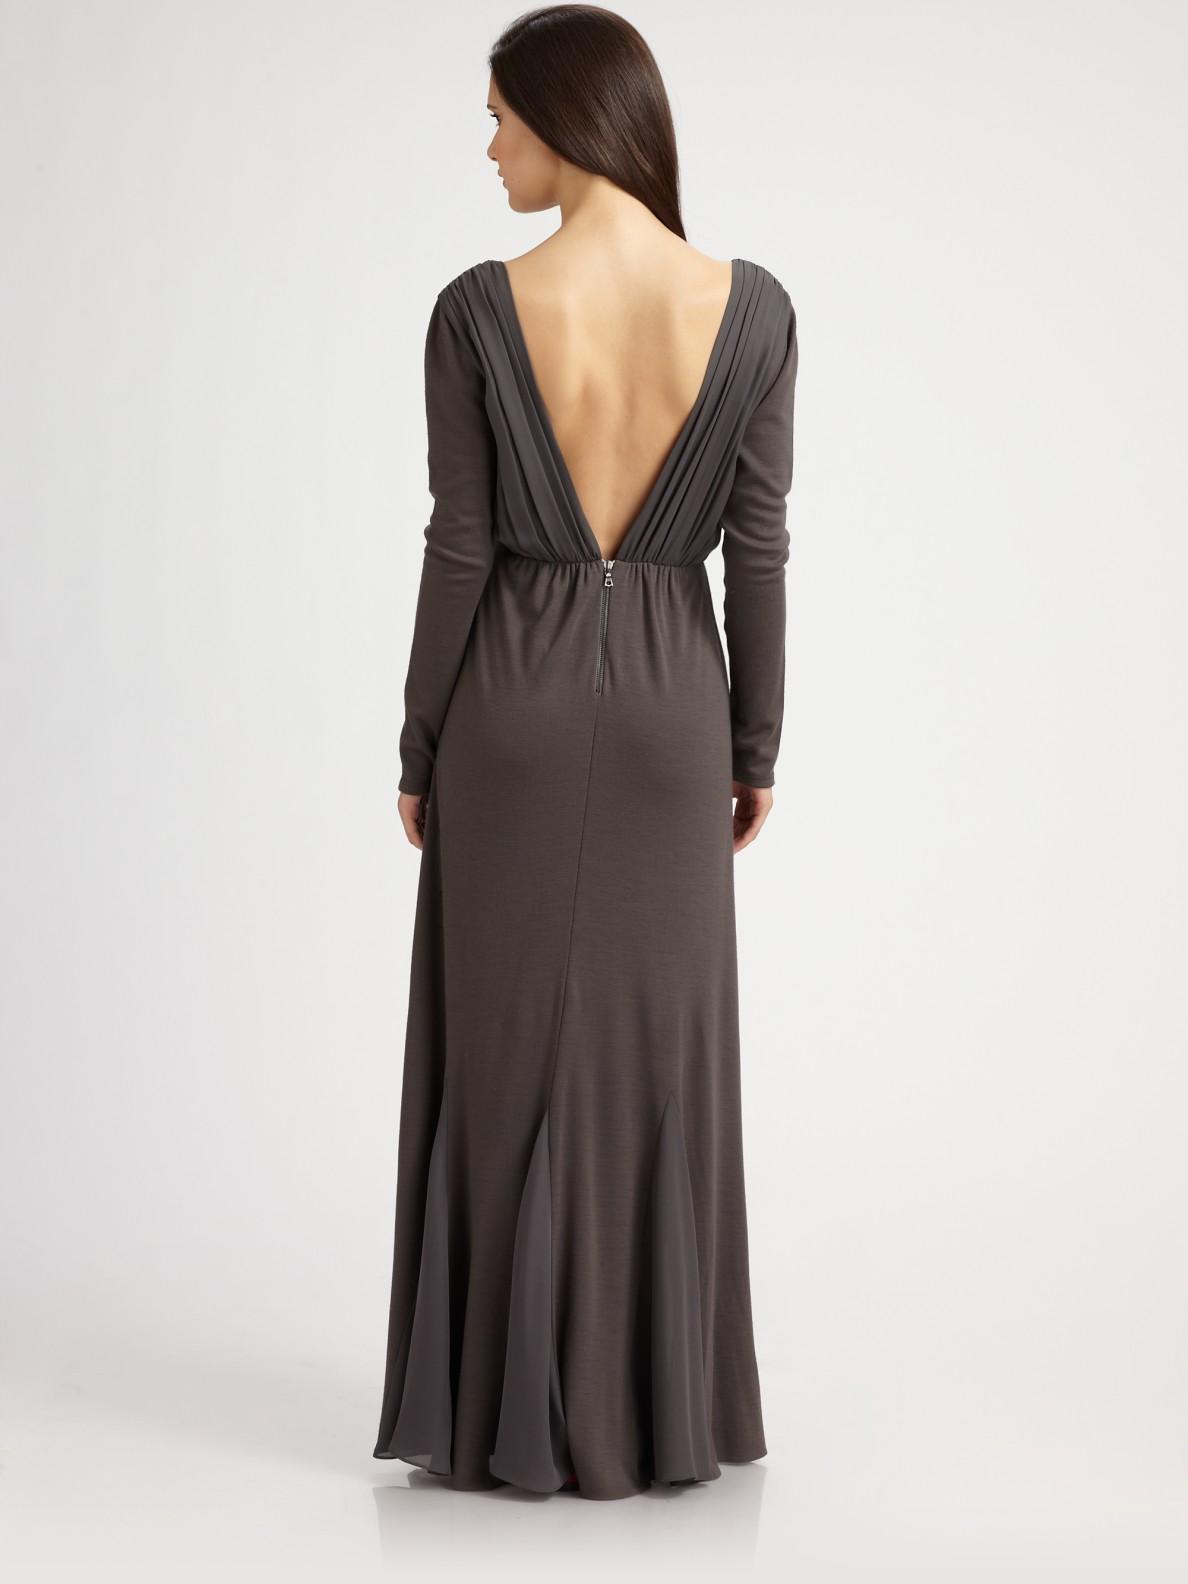 Alice Olivia Theron Long Sleeve Maxi Dress In Gray Lyst